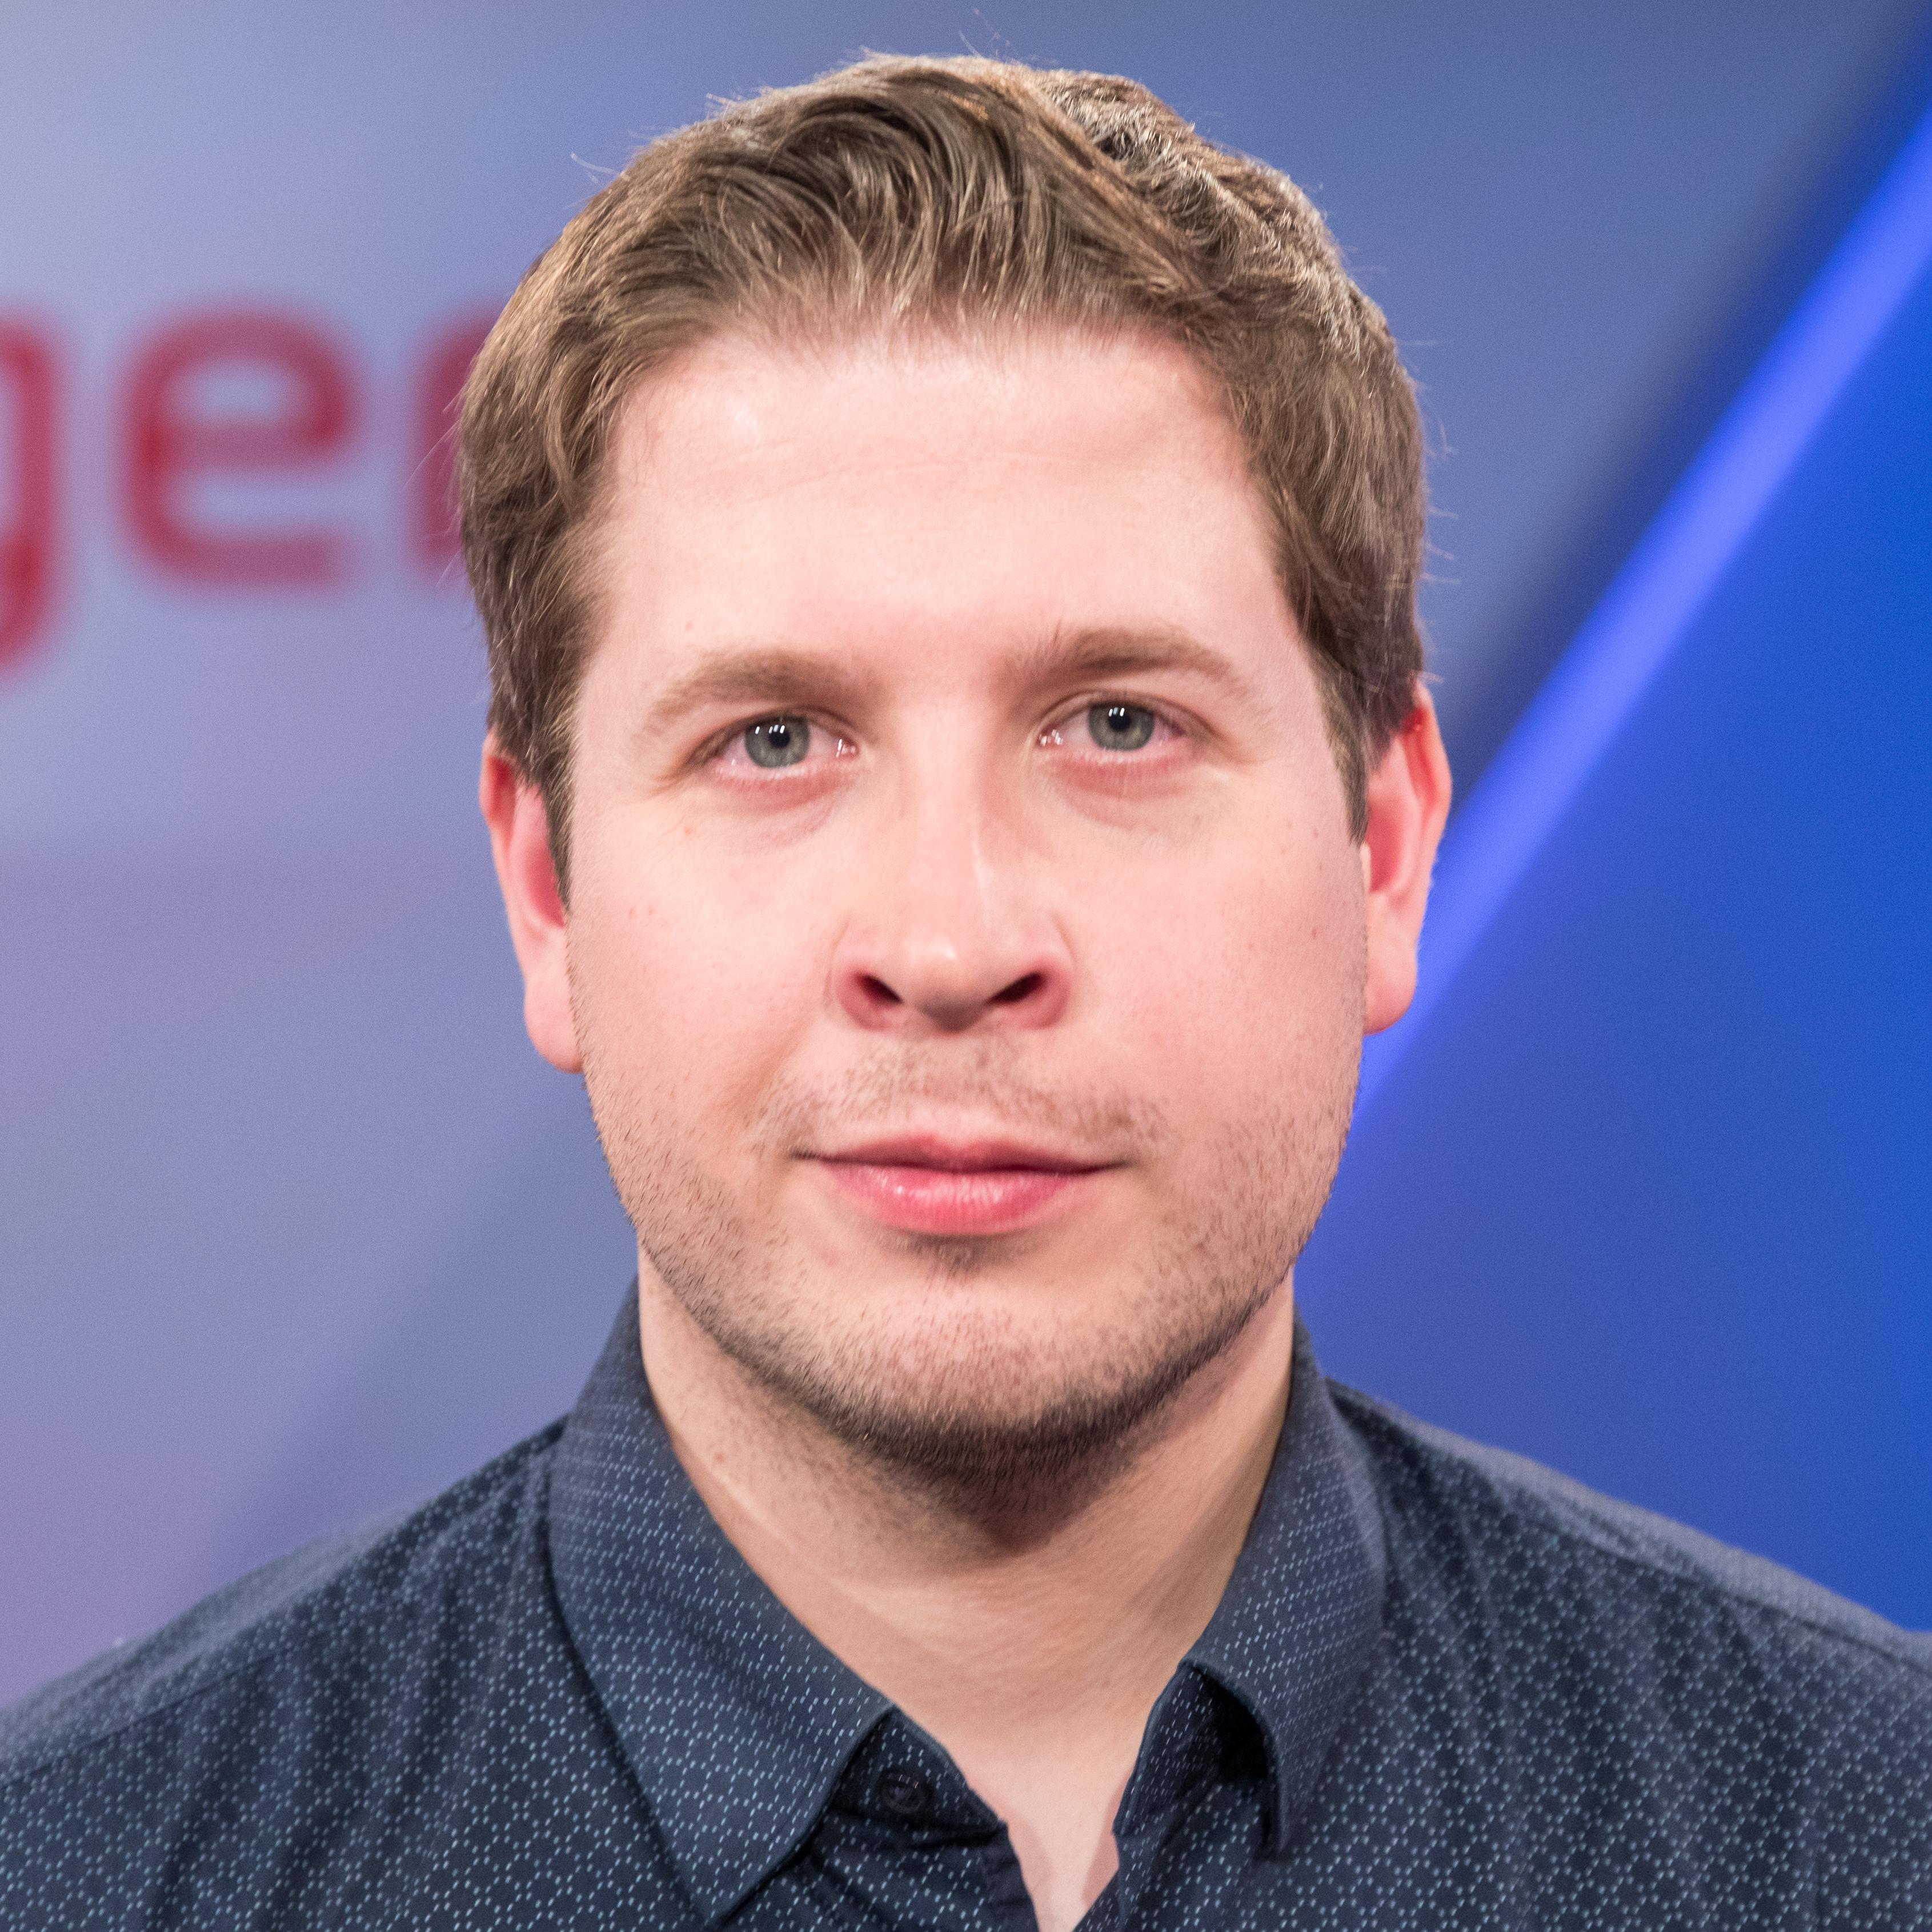 Kevin Kuhnert Wikipedia